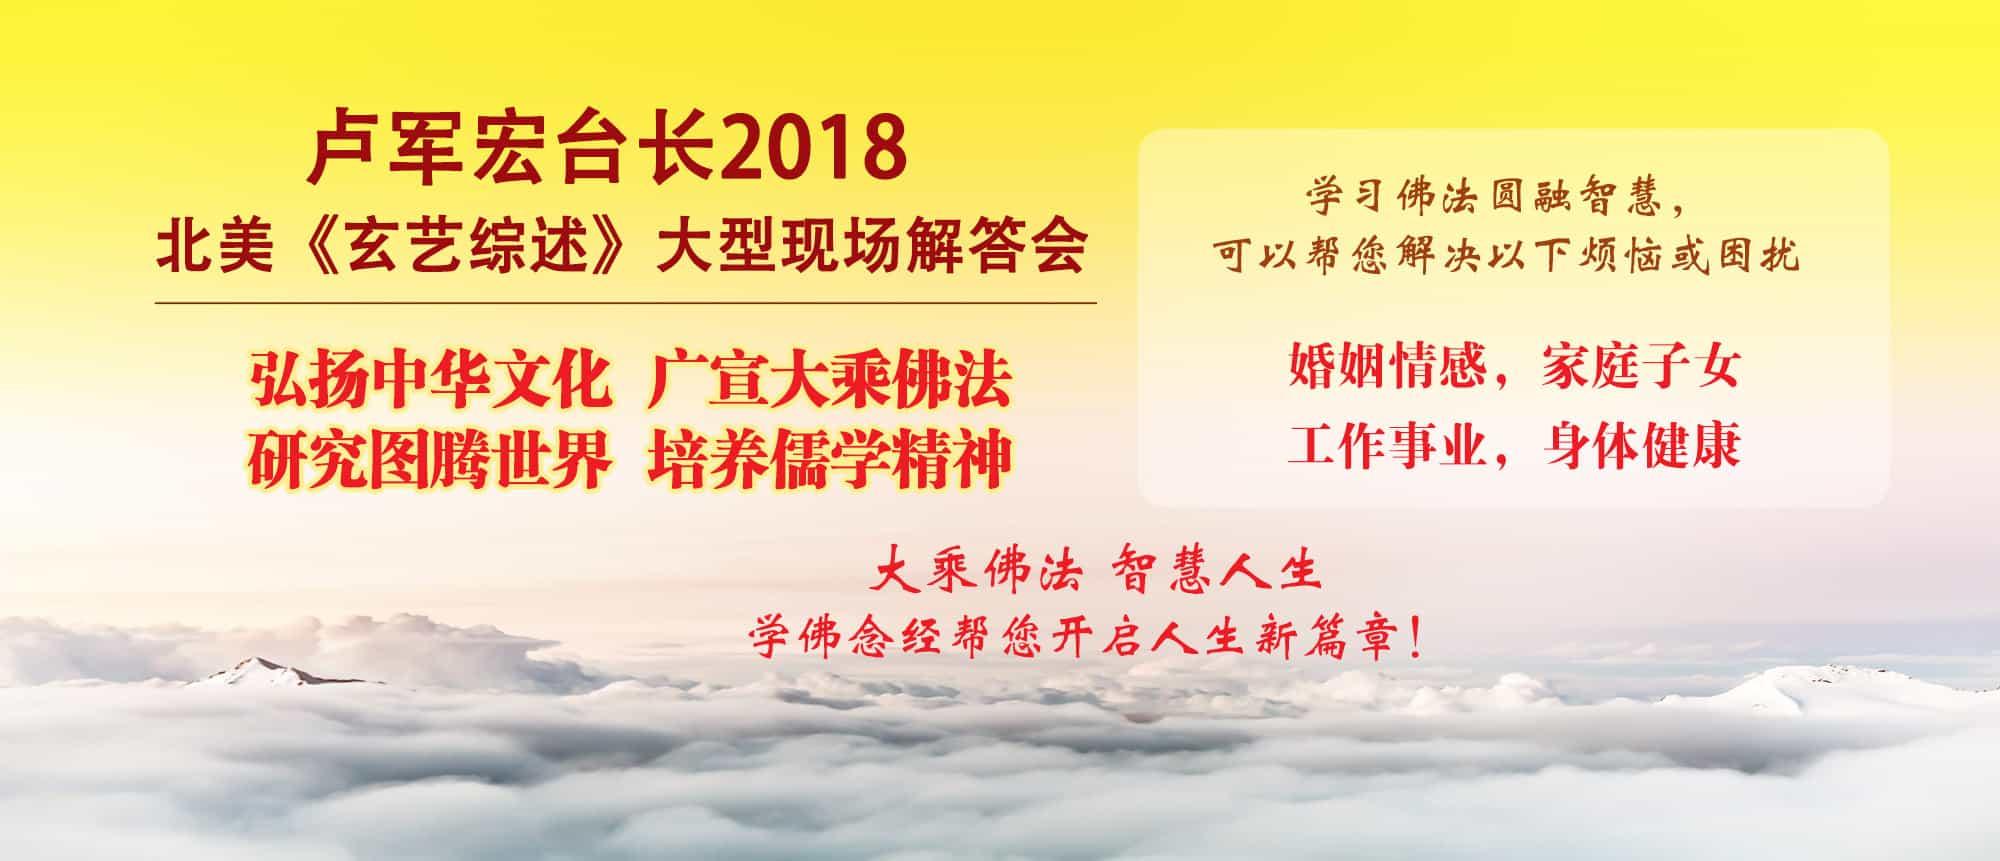 WeChat Image_20180819001543